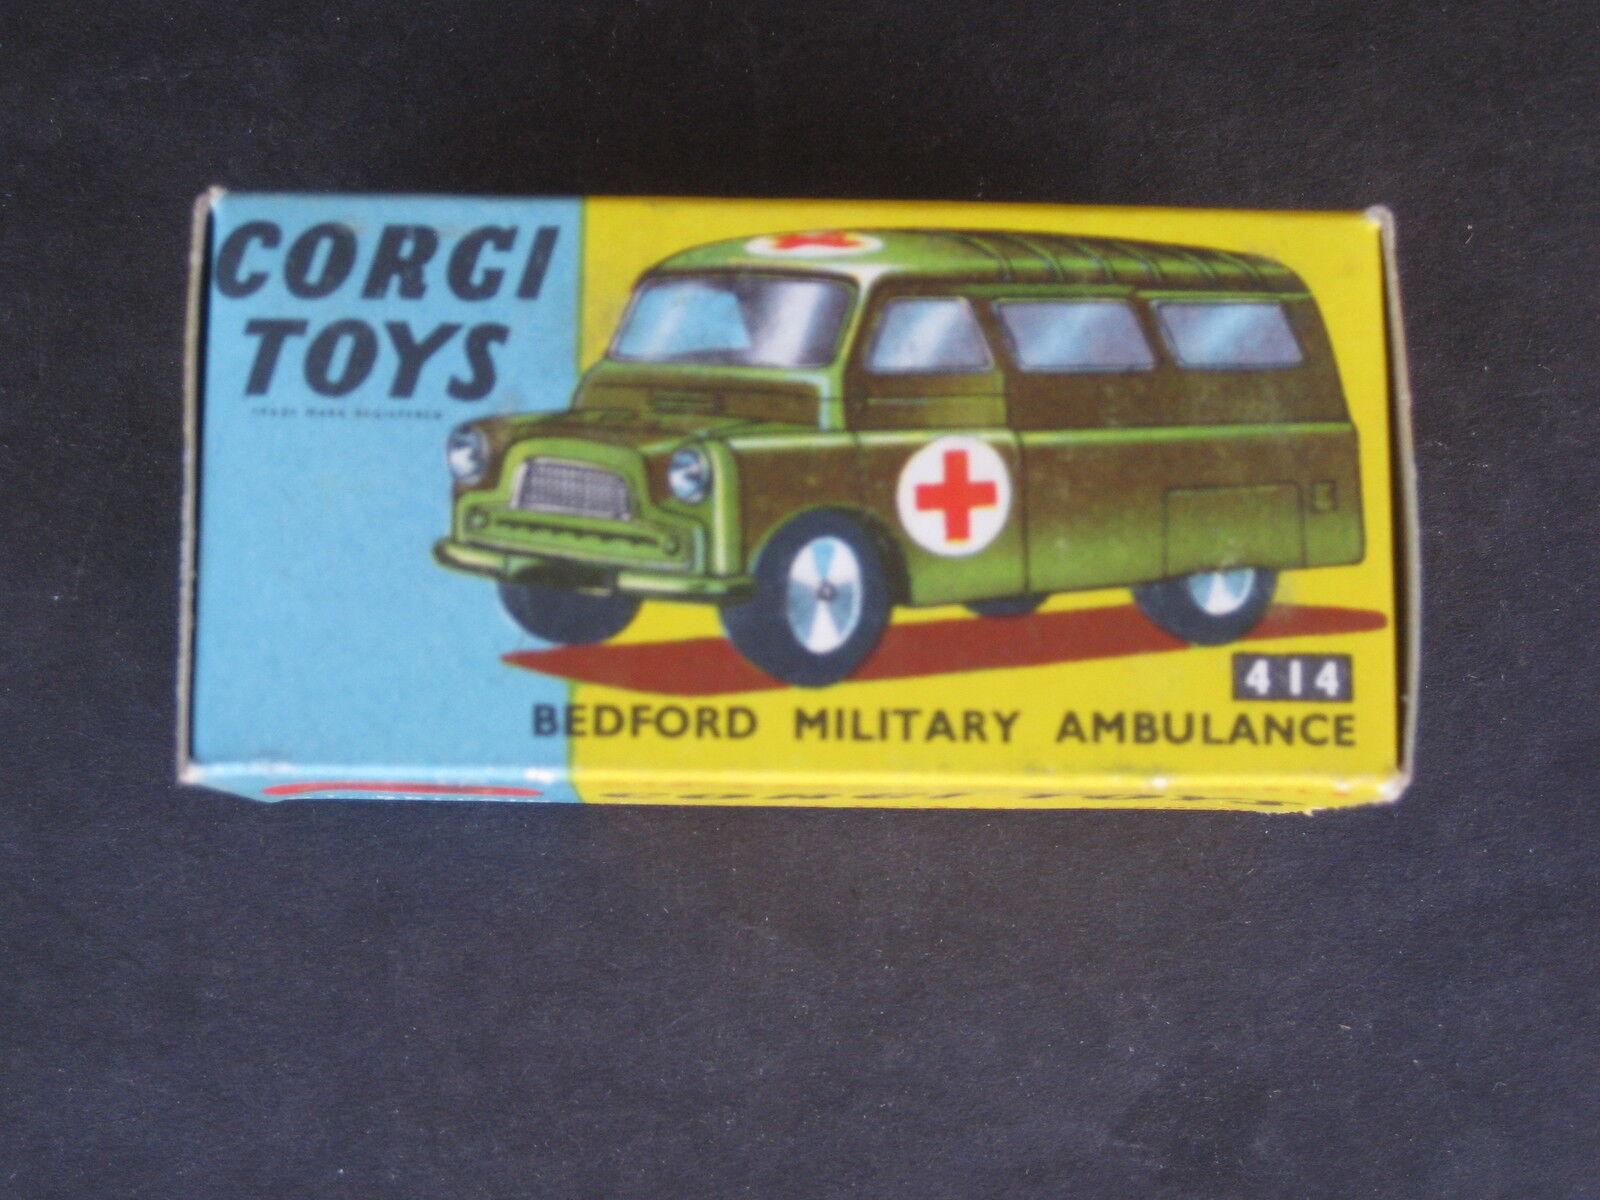 Corgi Bedford Military Ambulance 414  MINT CONDITION ORIGINAL BOX